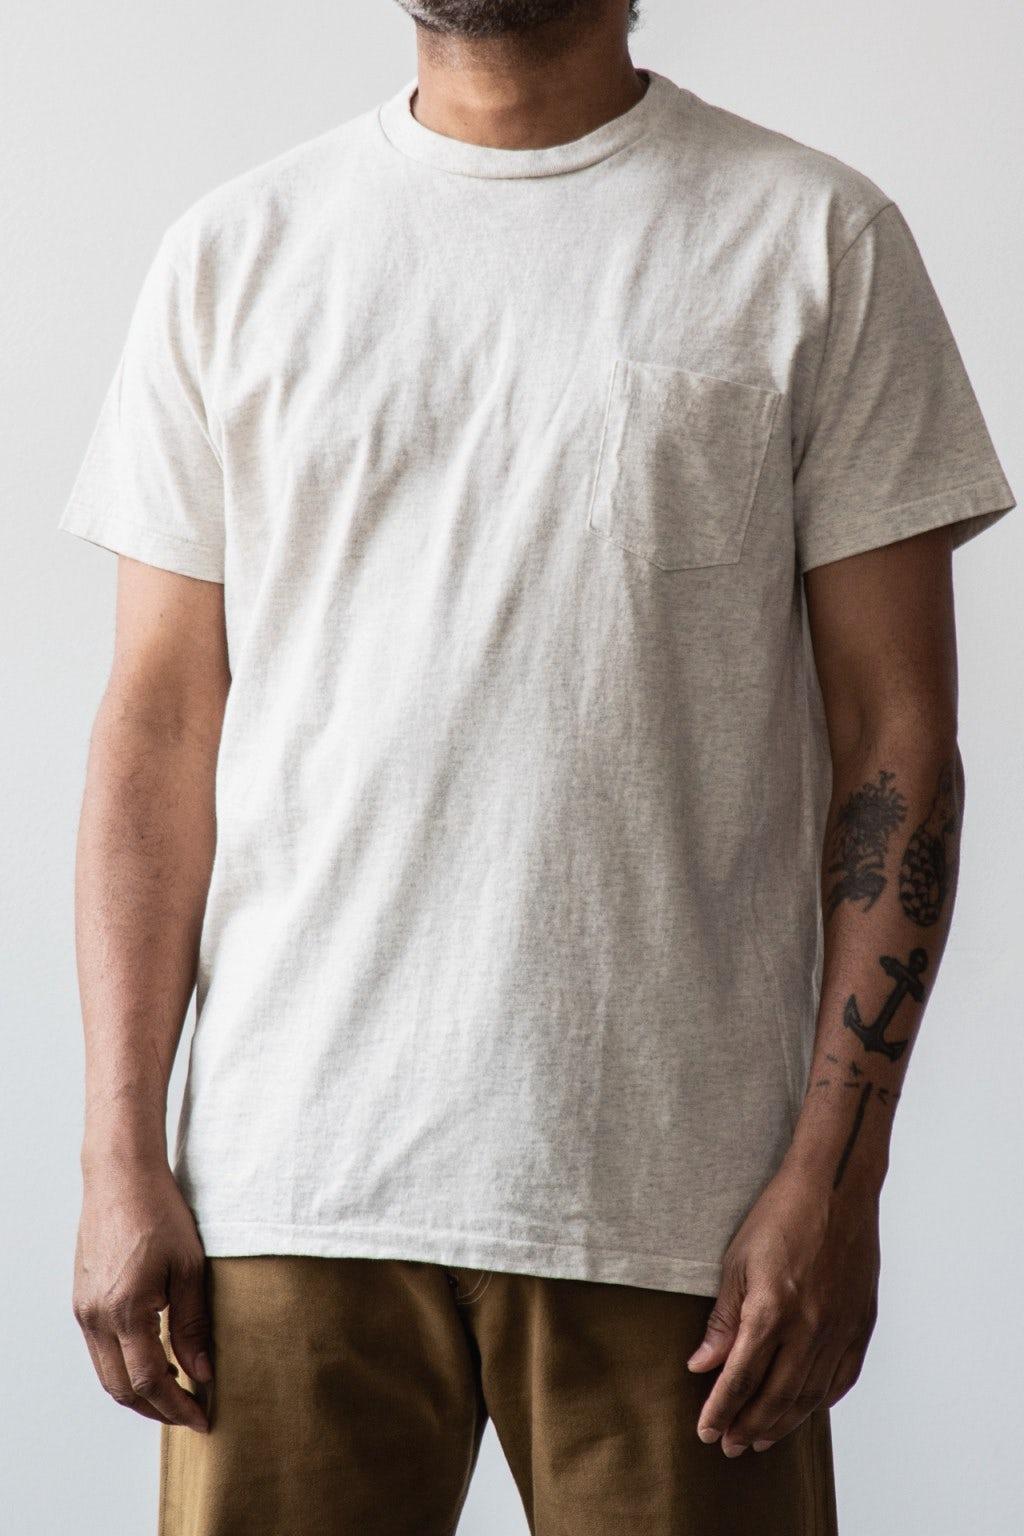 Velva Sheen Two Pack Pocket T-Shirts White & Oatmeal